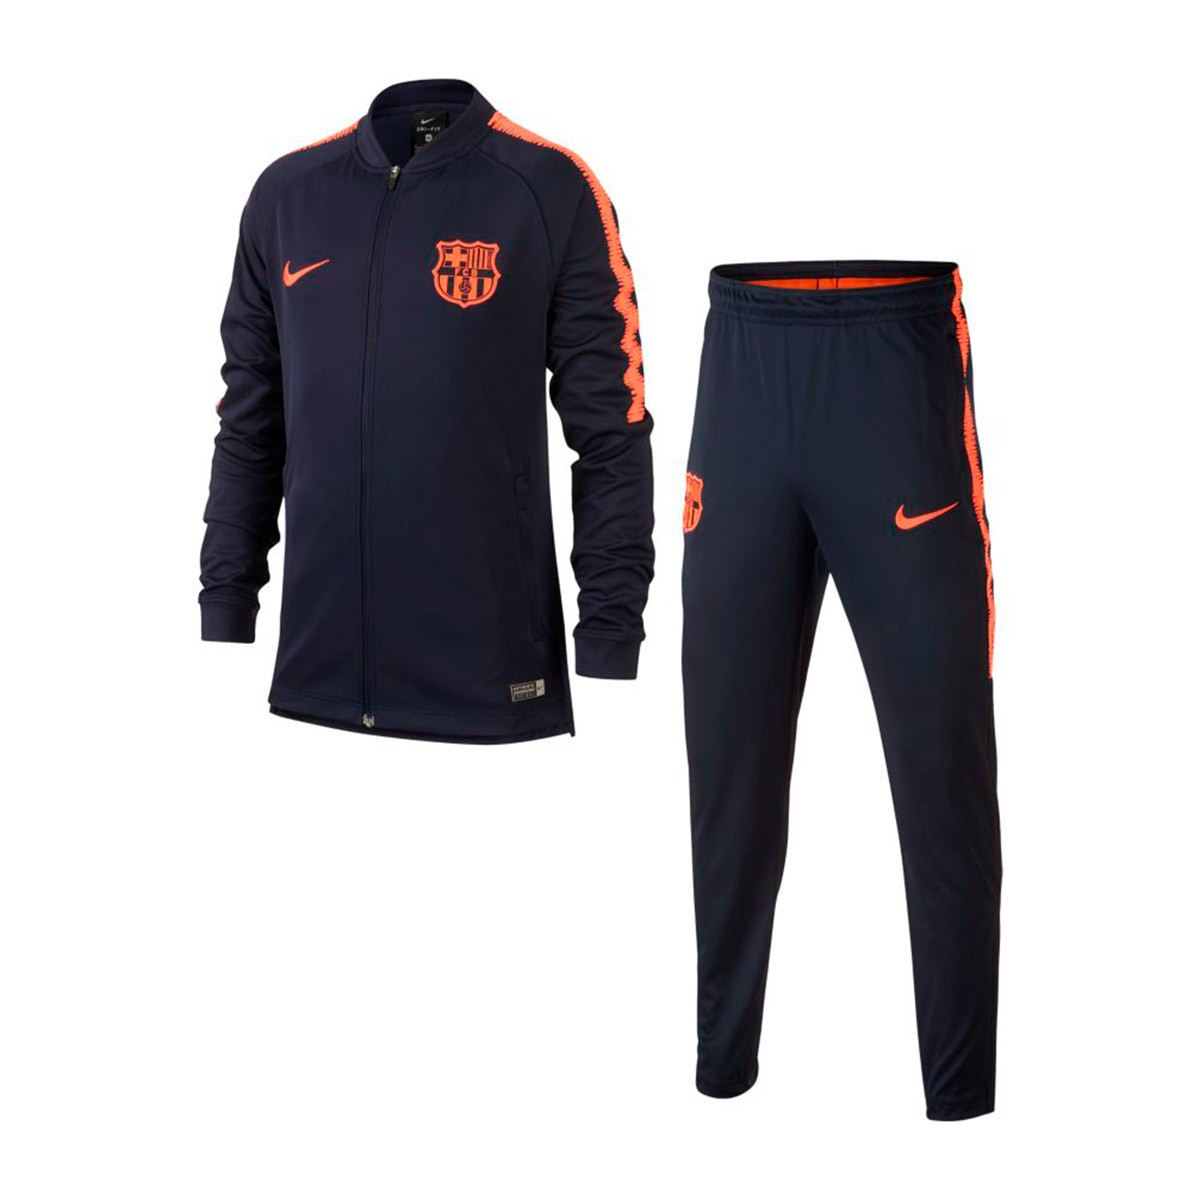 Chándal Nike FC Barcelona Obsidian Dry Squad Niño 2017 2018 Obsidian Barcelona Hyper 52e82e